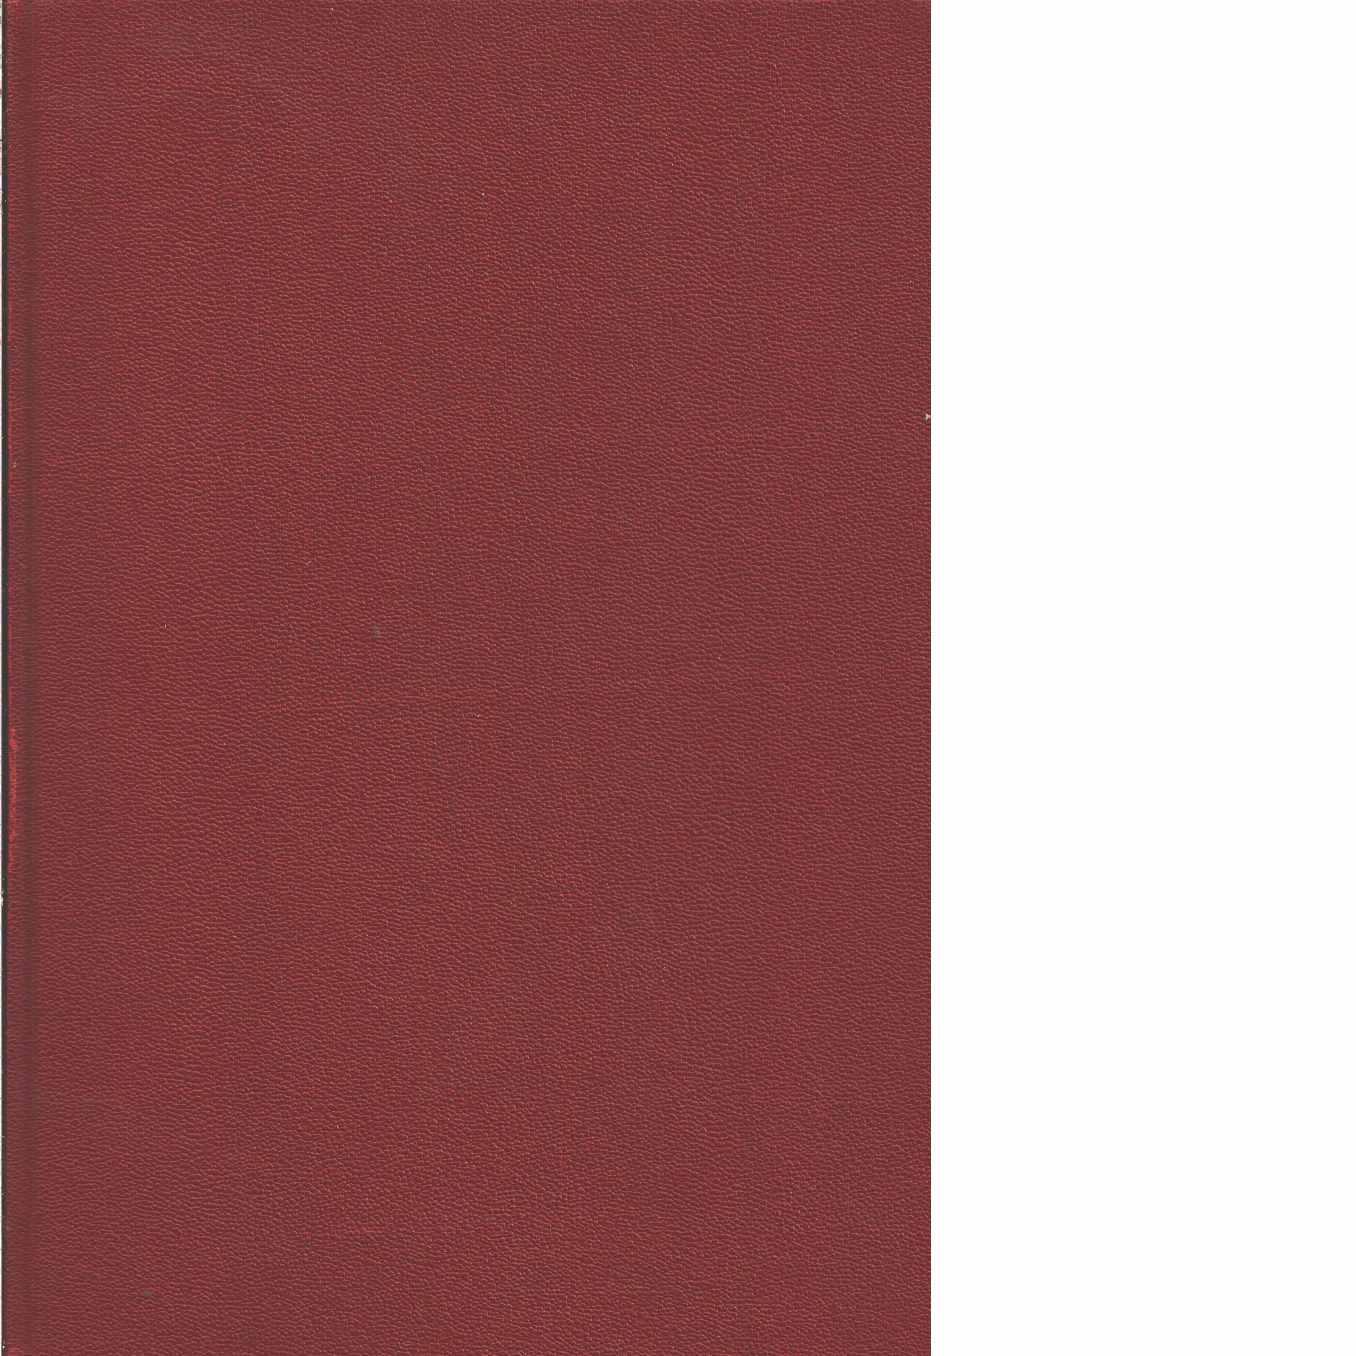 Chassiboken [5], Svetsning : tabeller : råd - Red. Engström, Sigvard m.fl.